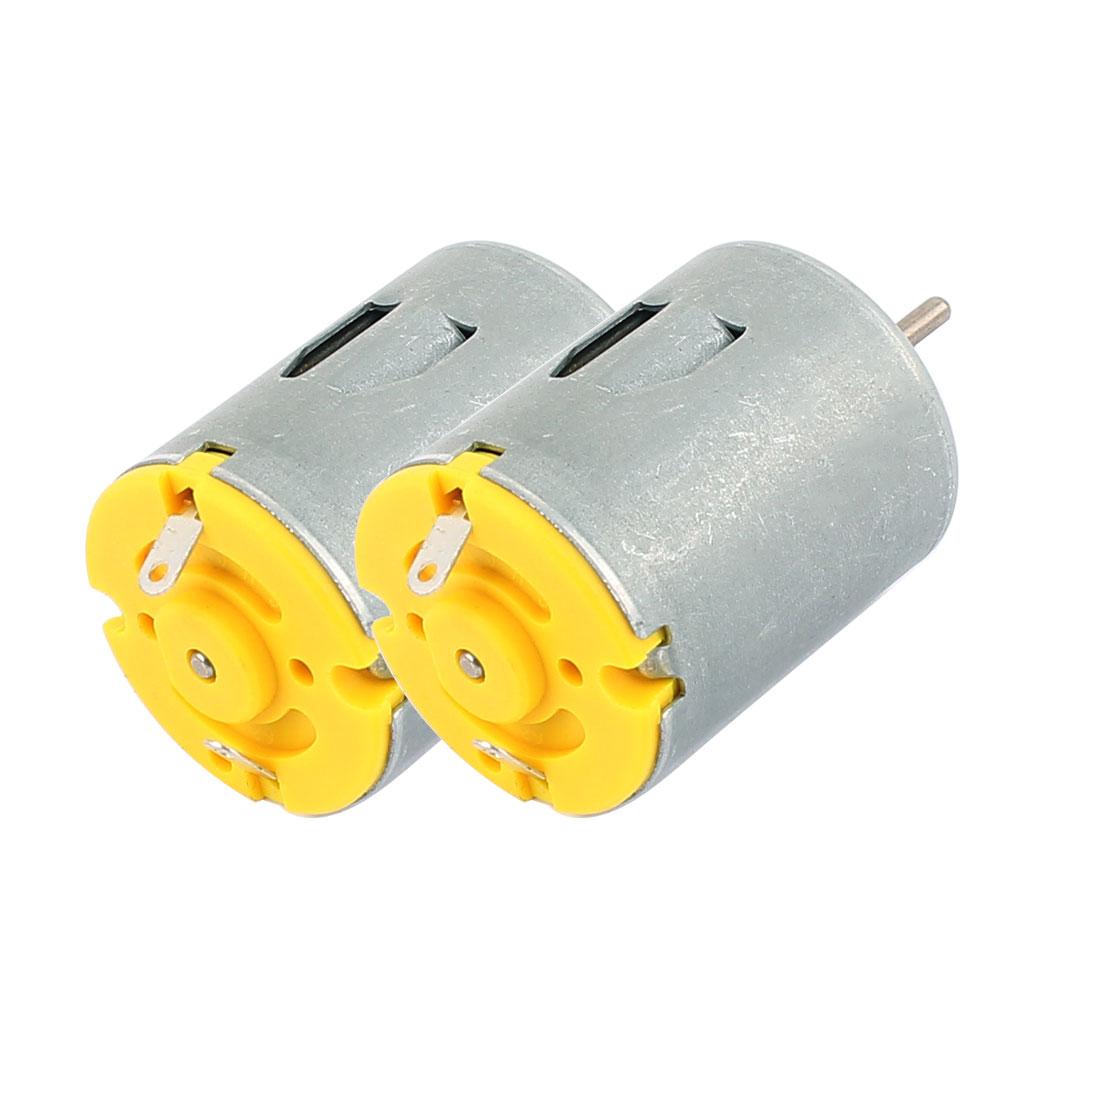 2Pcs DC3-6V 4000RPM High Speed Mini DC Motor for Smart Cars DIY Toys